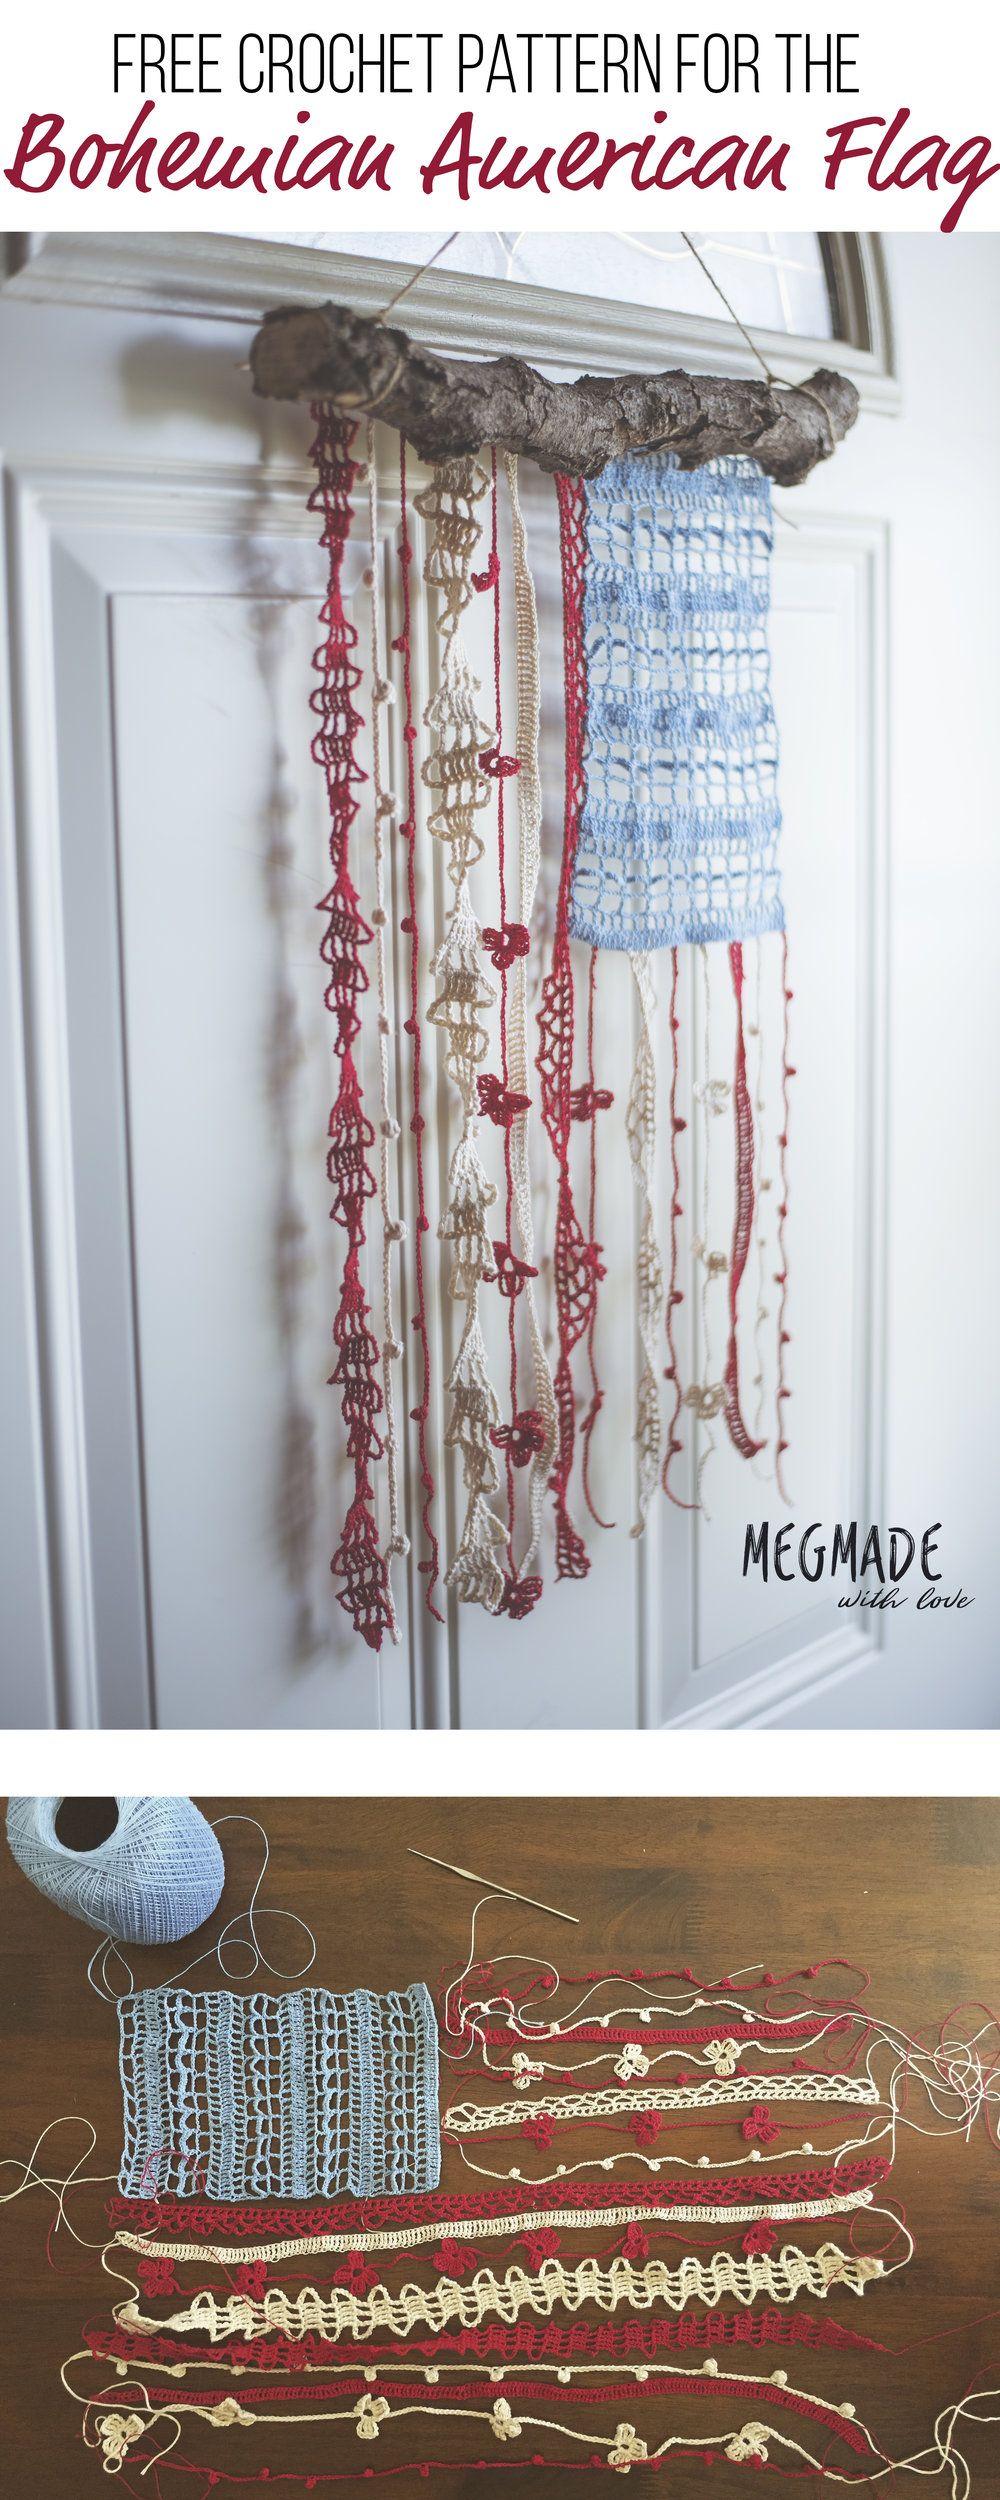 Bohemian American Flag Crochet Pattern | Couture, Ganchillo y Amar